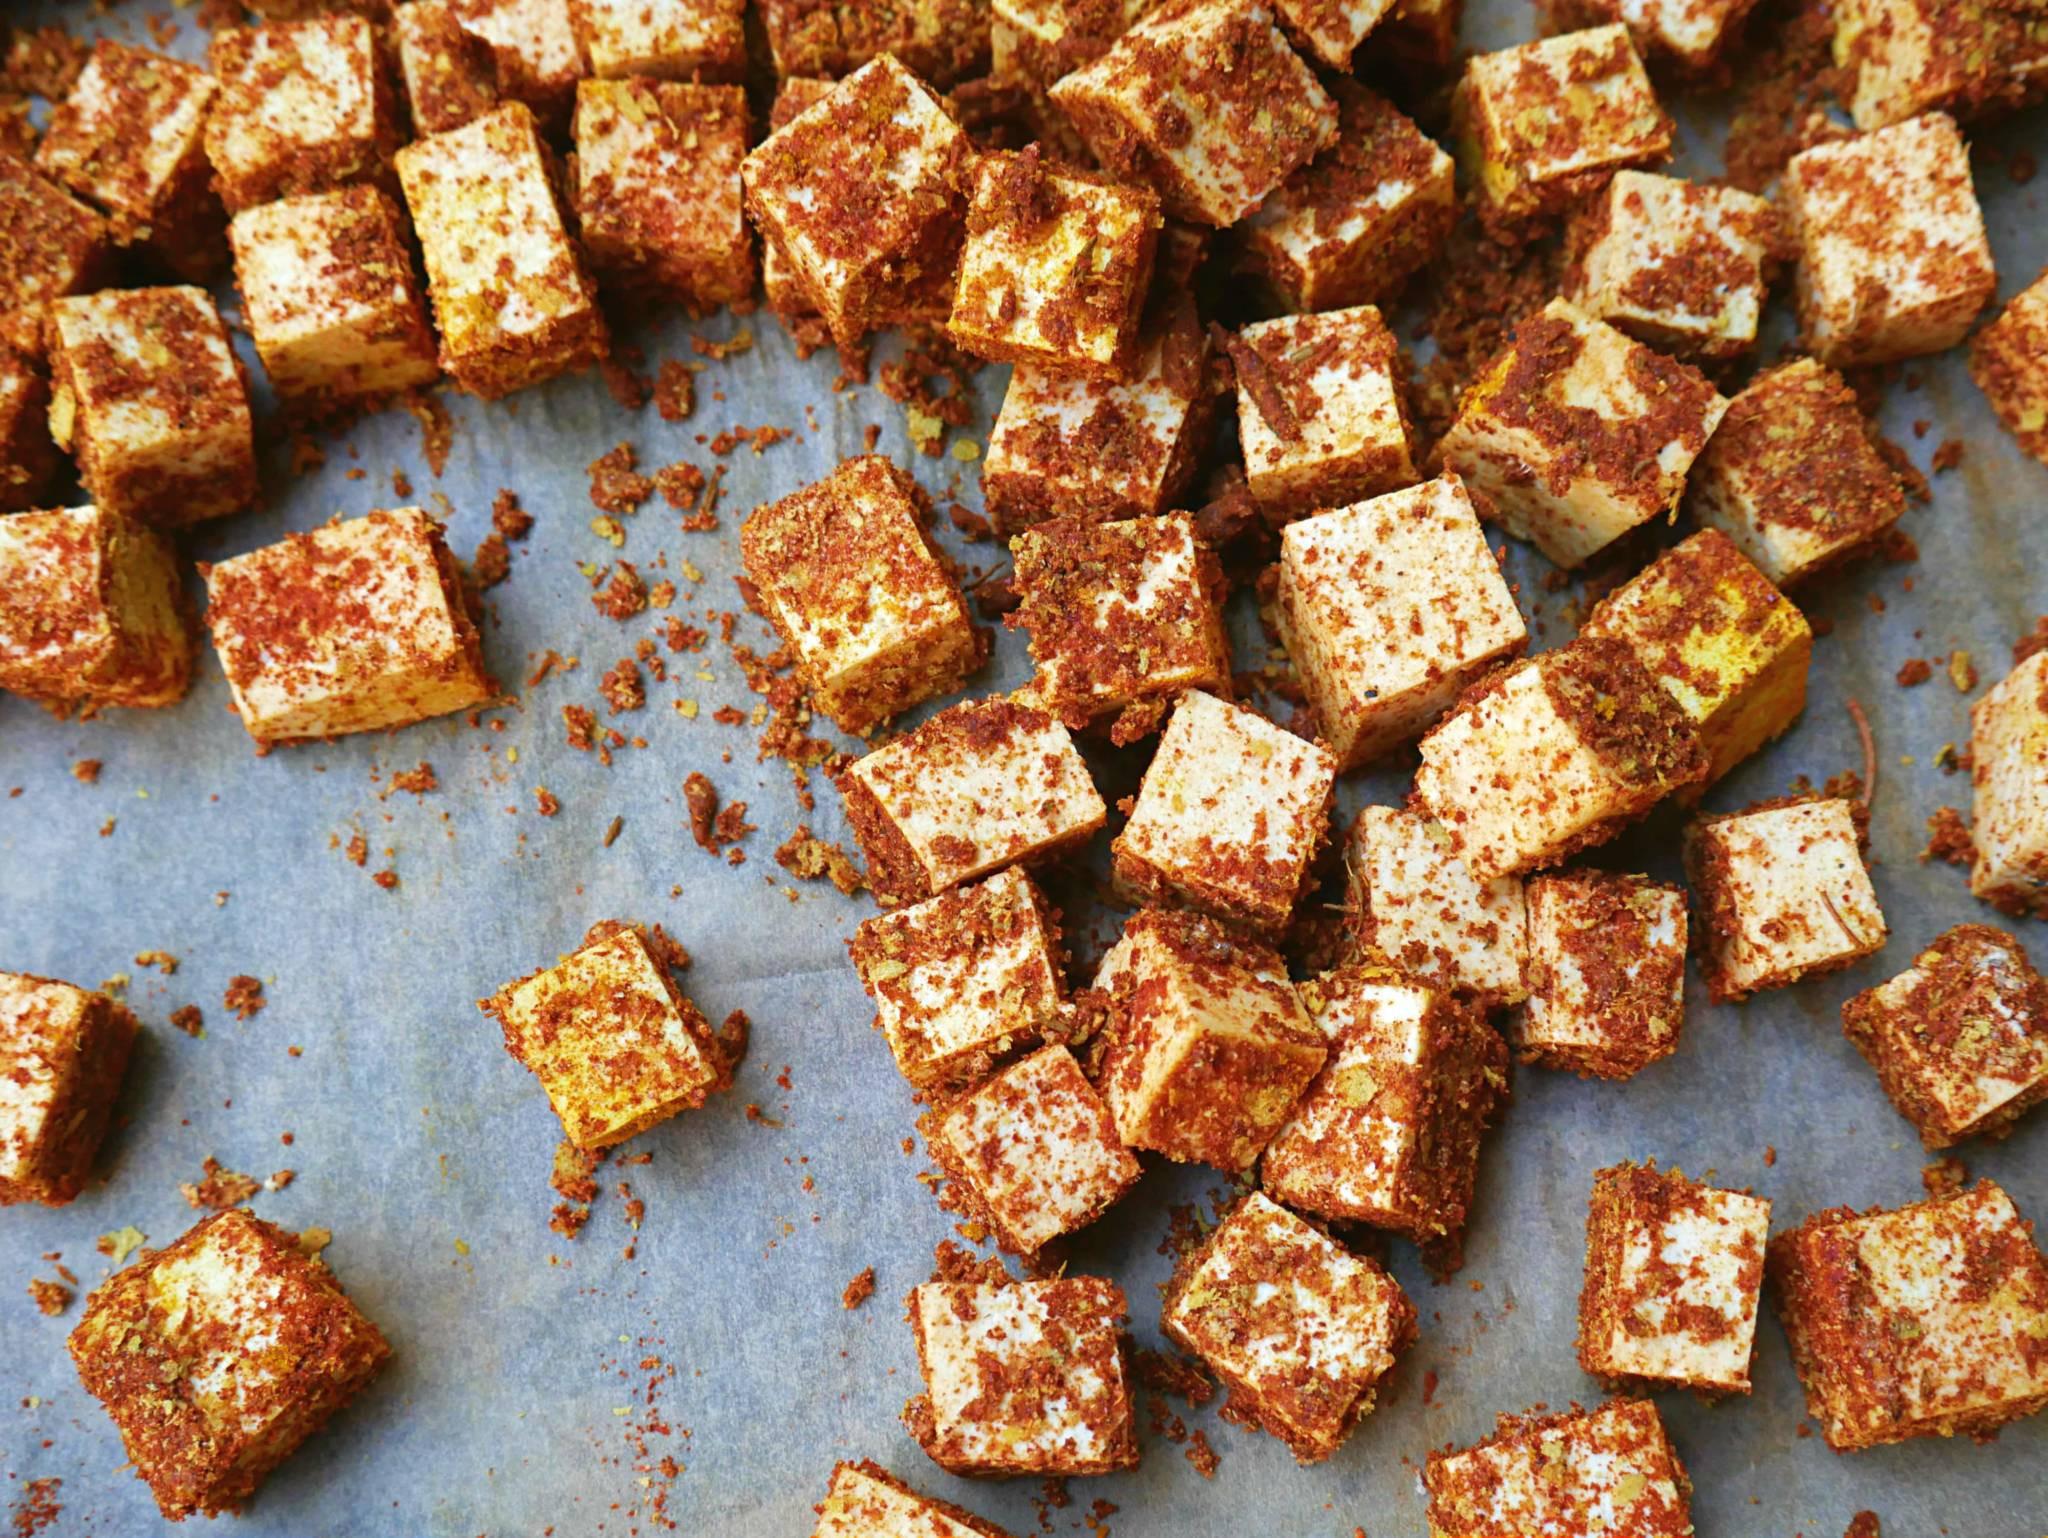 Healthy Baked Tofu Recipes  Baked Tofu Recipe Easy Healthy Oil Free Vegan Tofu